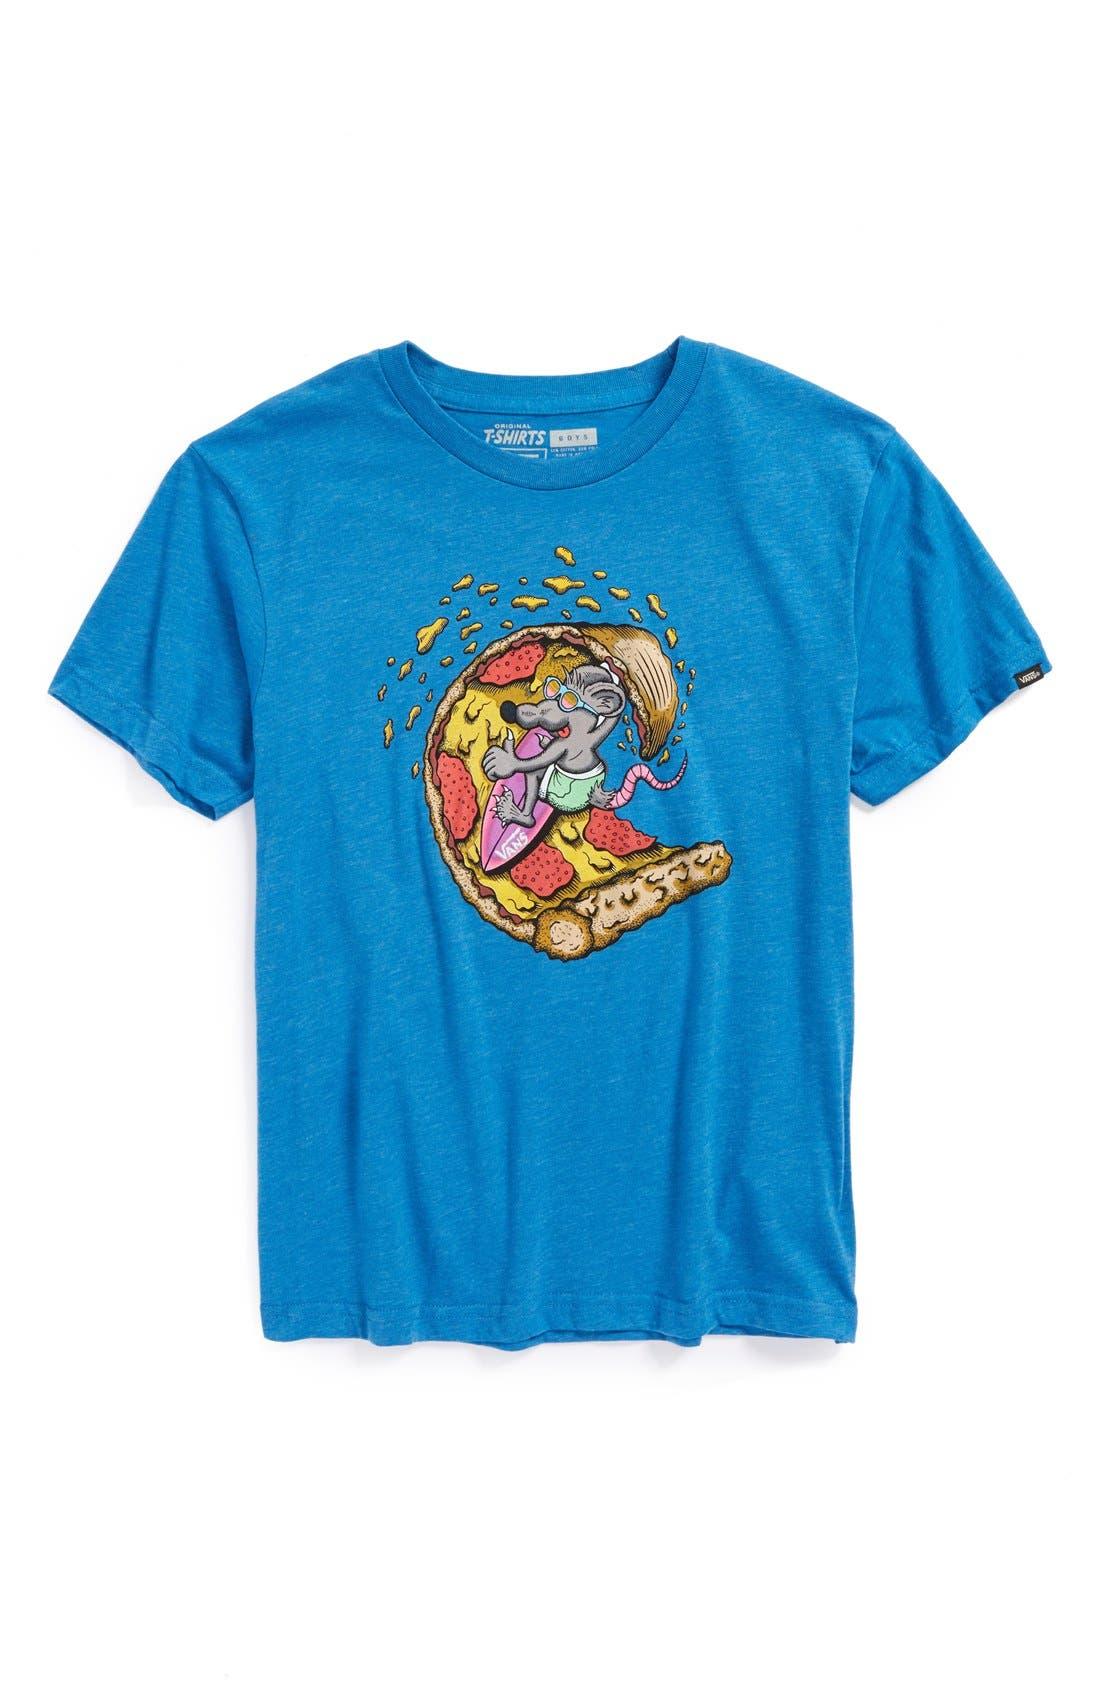 Main Image - Vans 'Pizza Rat' Short Sleeve T-Shirt (Big Boys)